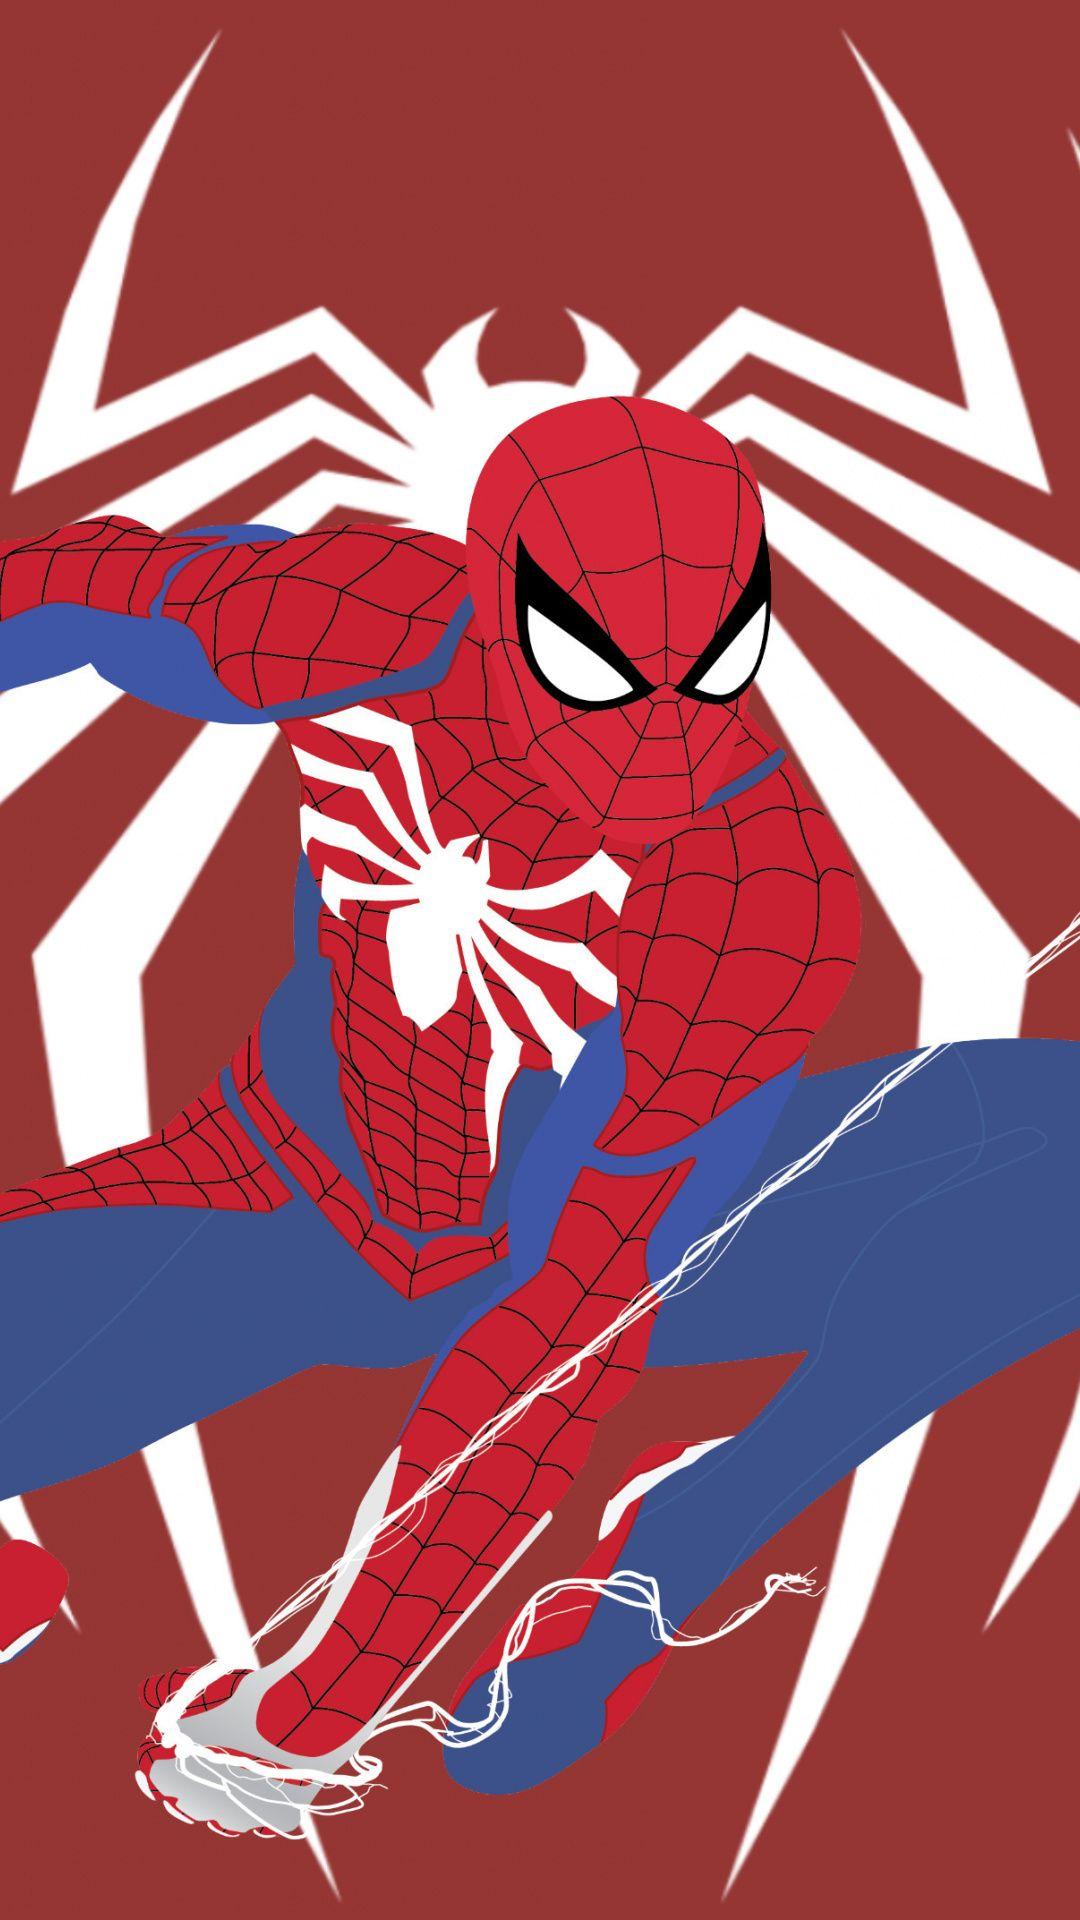 Spiderman PS4, video game, artwork, 1080x1920 wallpaper